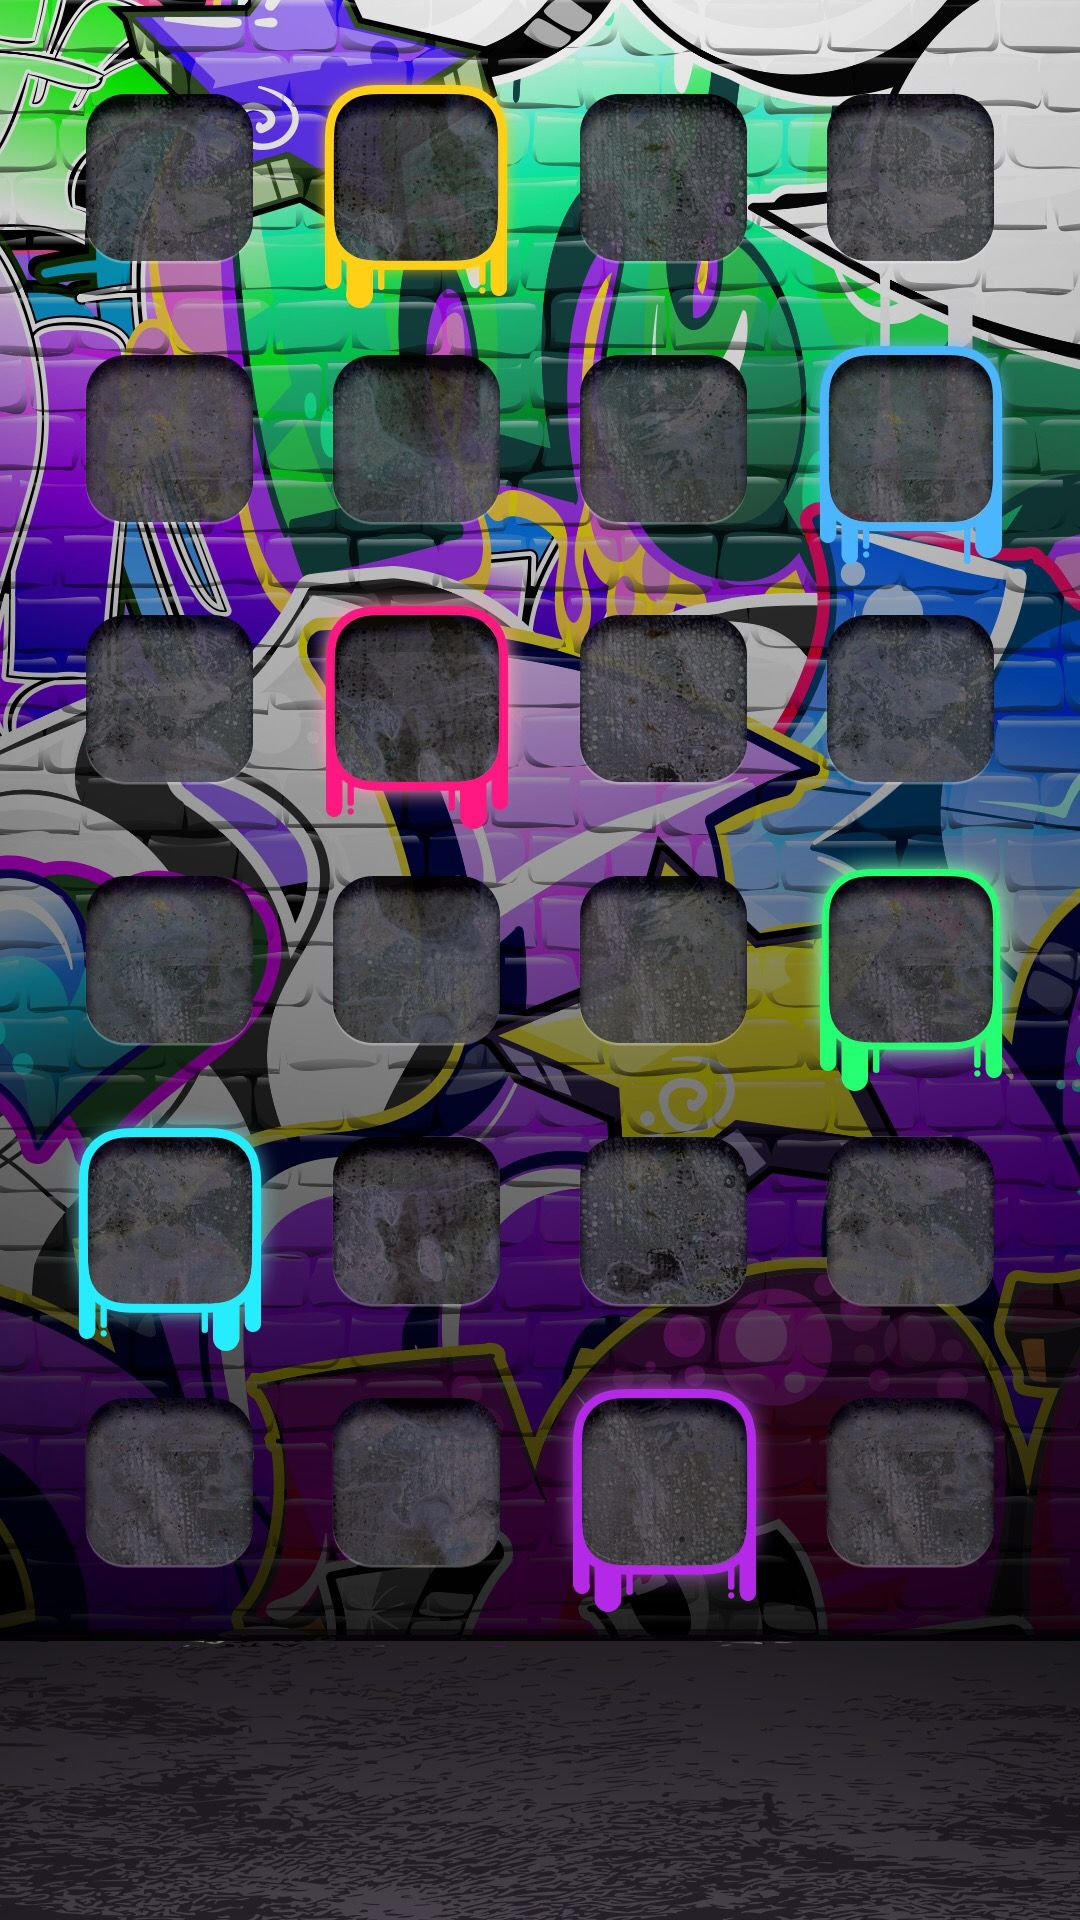 Graffiti iPhone Wallpaper Iphone wallpapers【2019